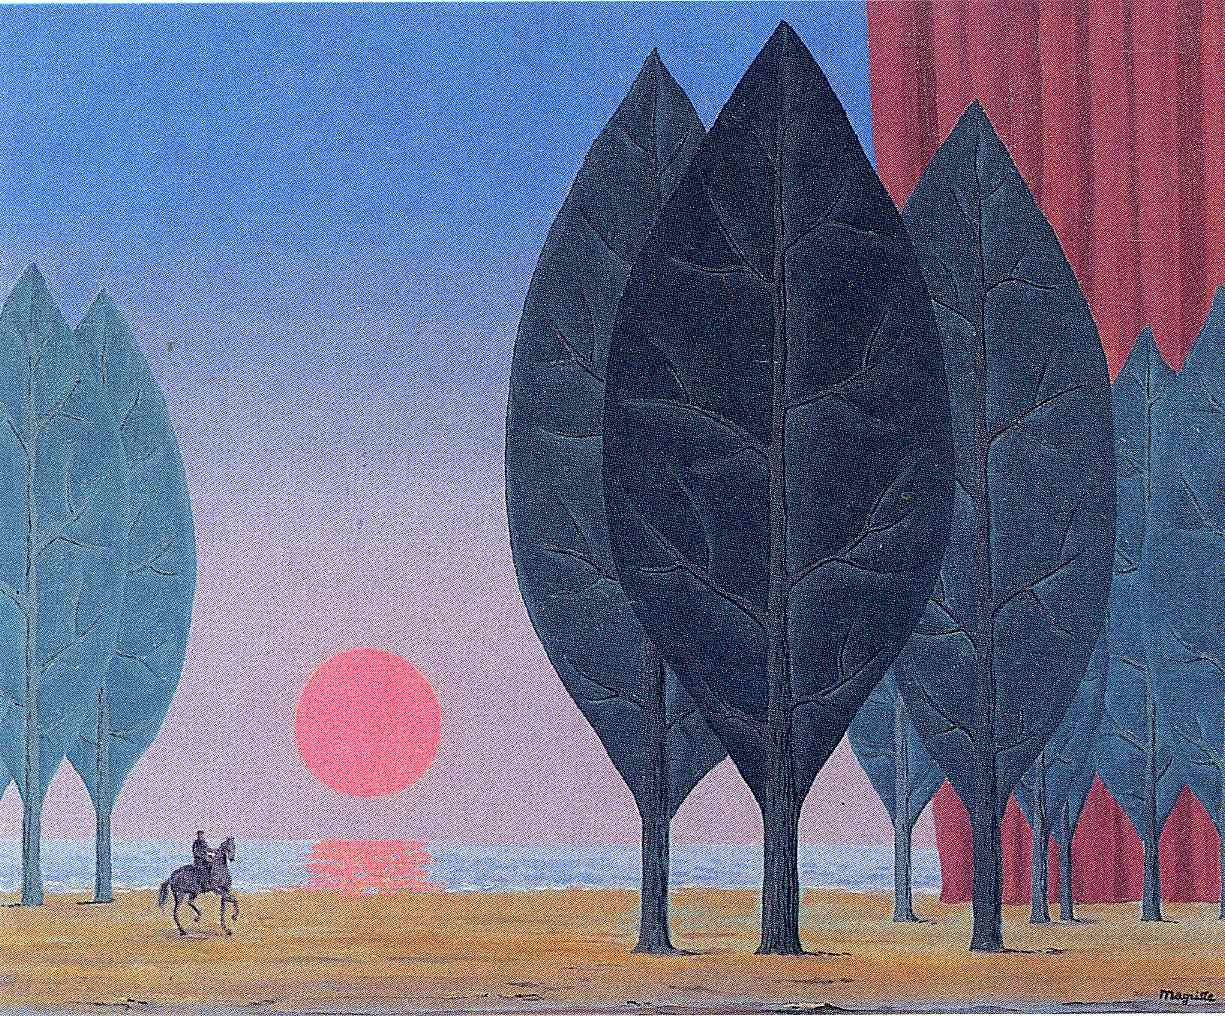 The hesitation waltz - Rene Magritte - WikiArt.org | Magritte art, Magritte  paintings, Rene magritte